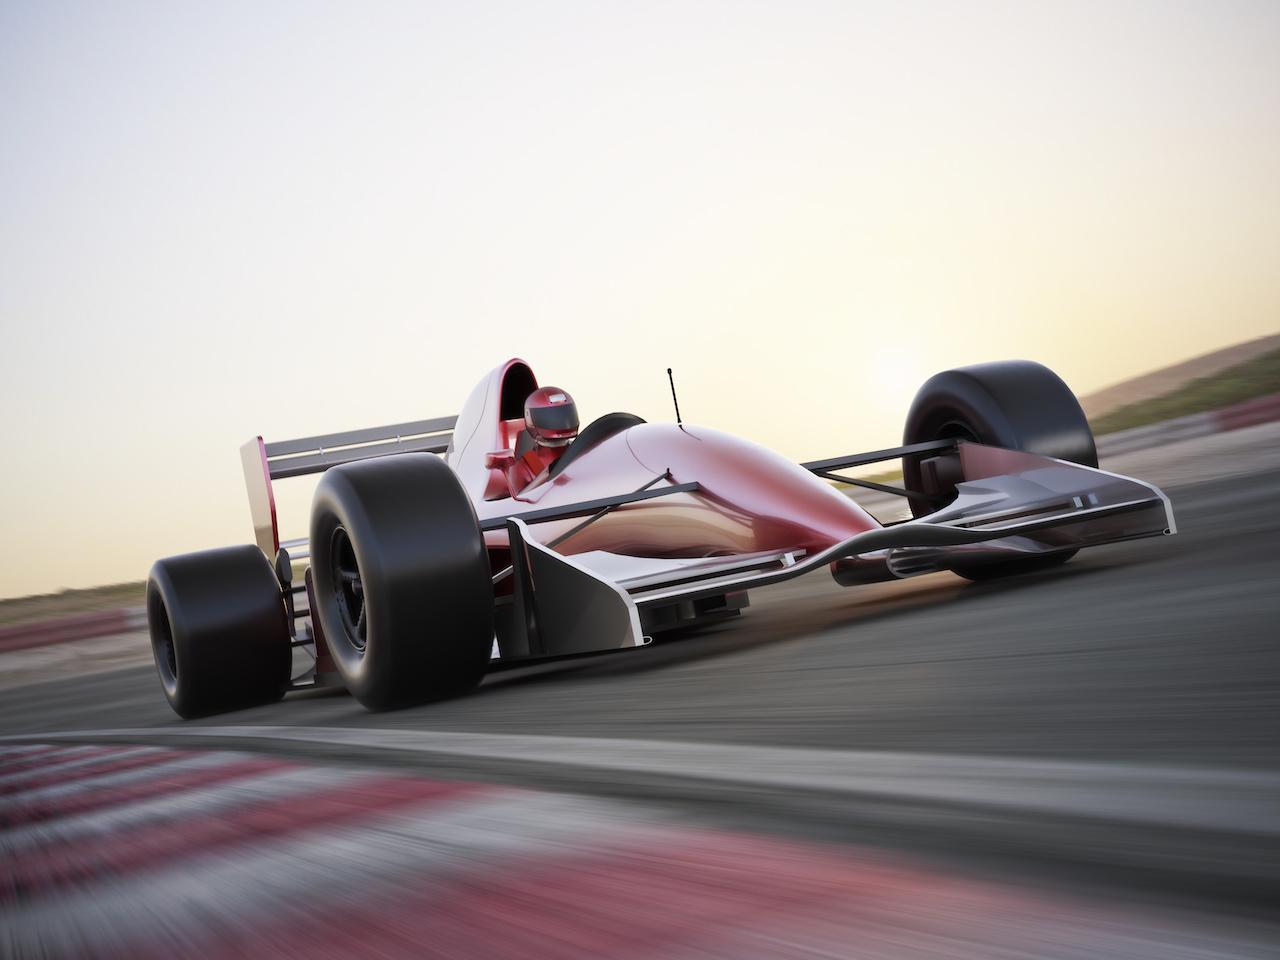 F1 Grand Prix Travel Offers